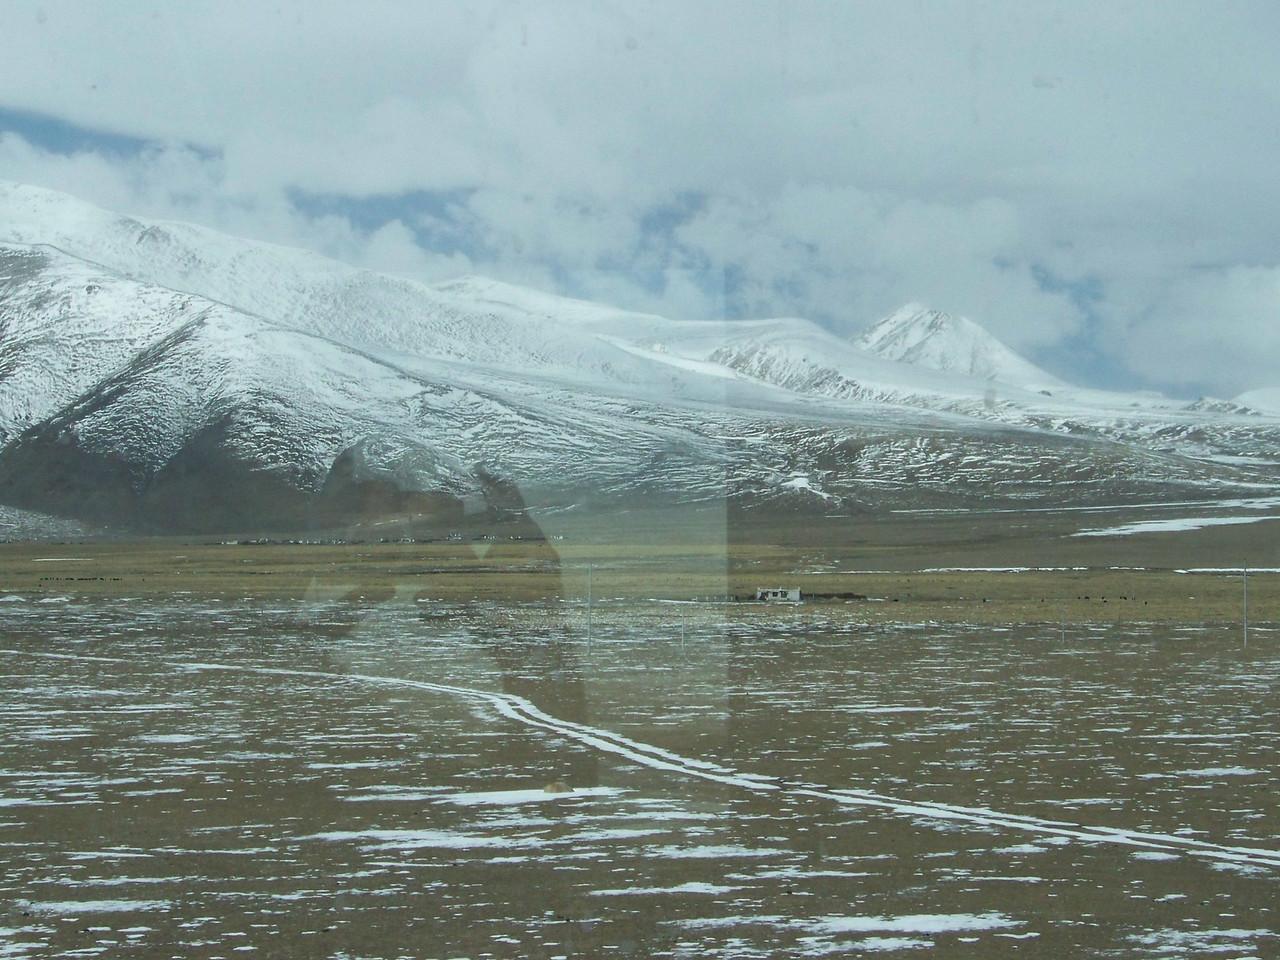 0112 - Scenery on Train Trip Between Beijing and Lhasa.JPG